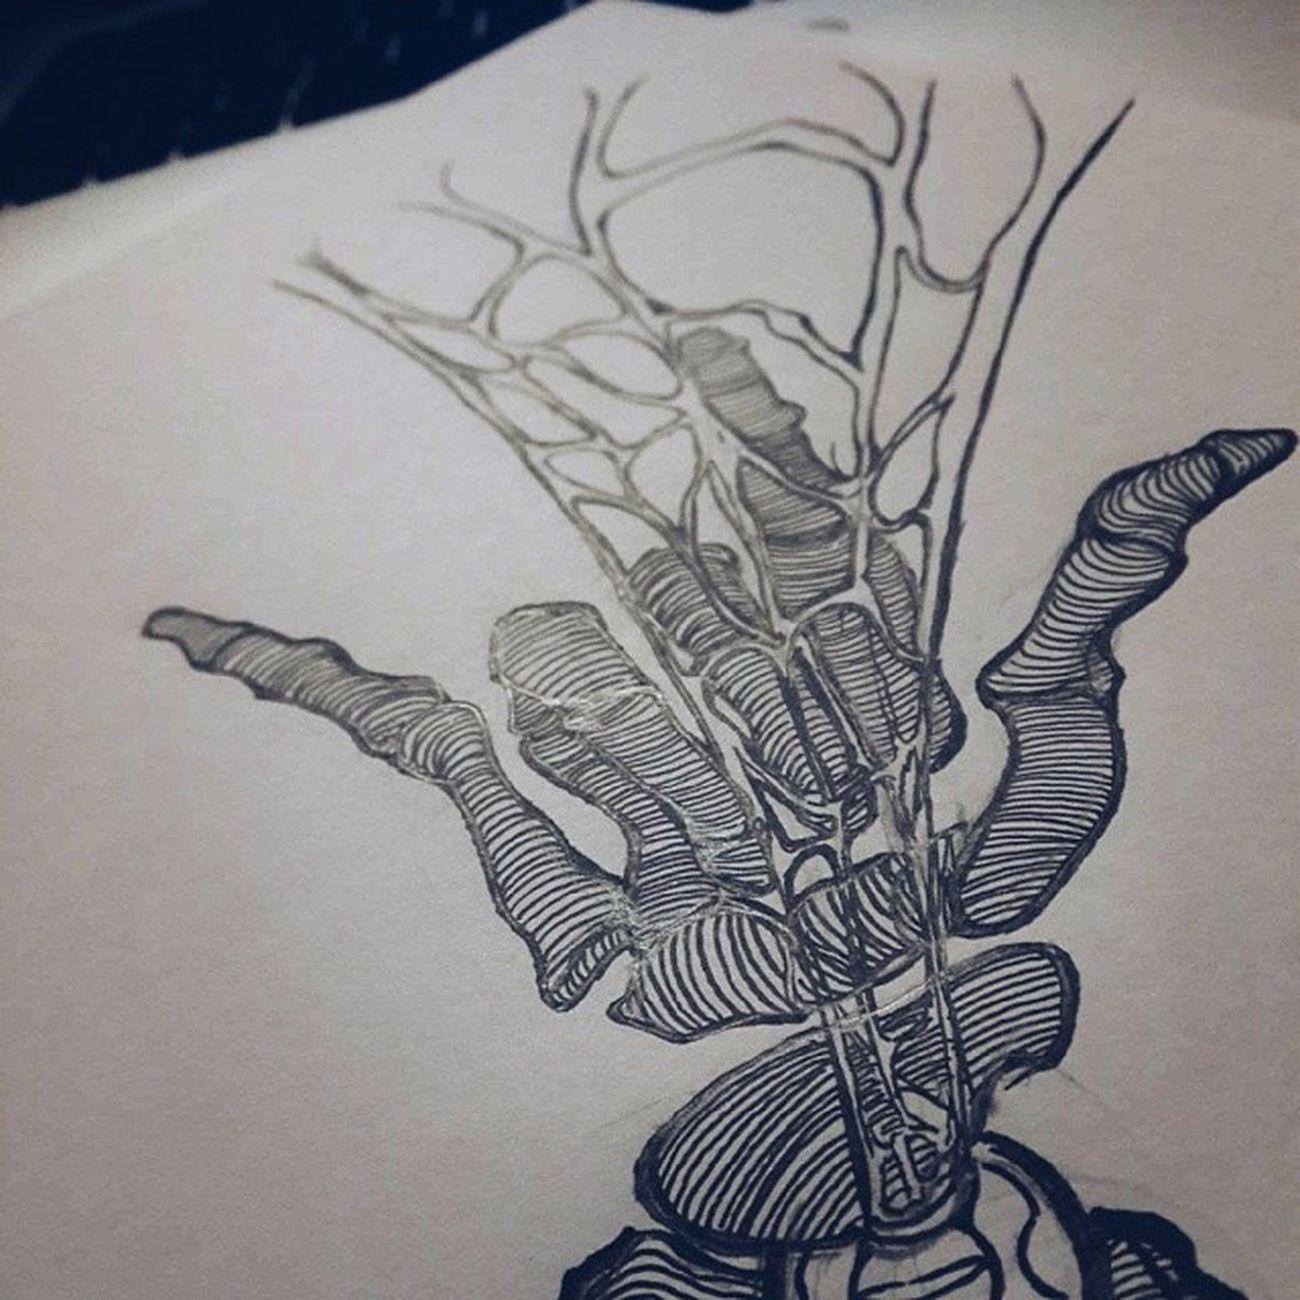 Lelakilabahlabah Amazingspiderman2 Doodle Wip illustration photoshop taktererponn cubismholdjap skeleton